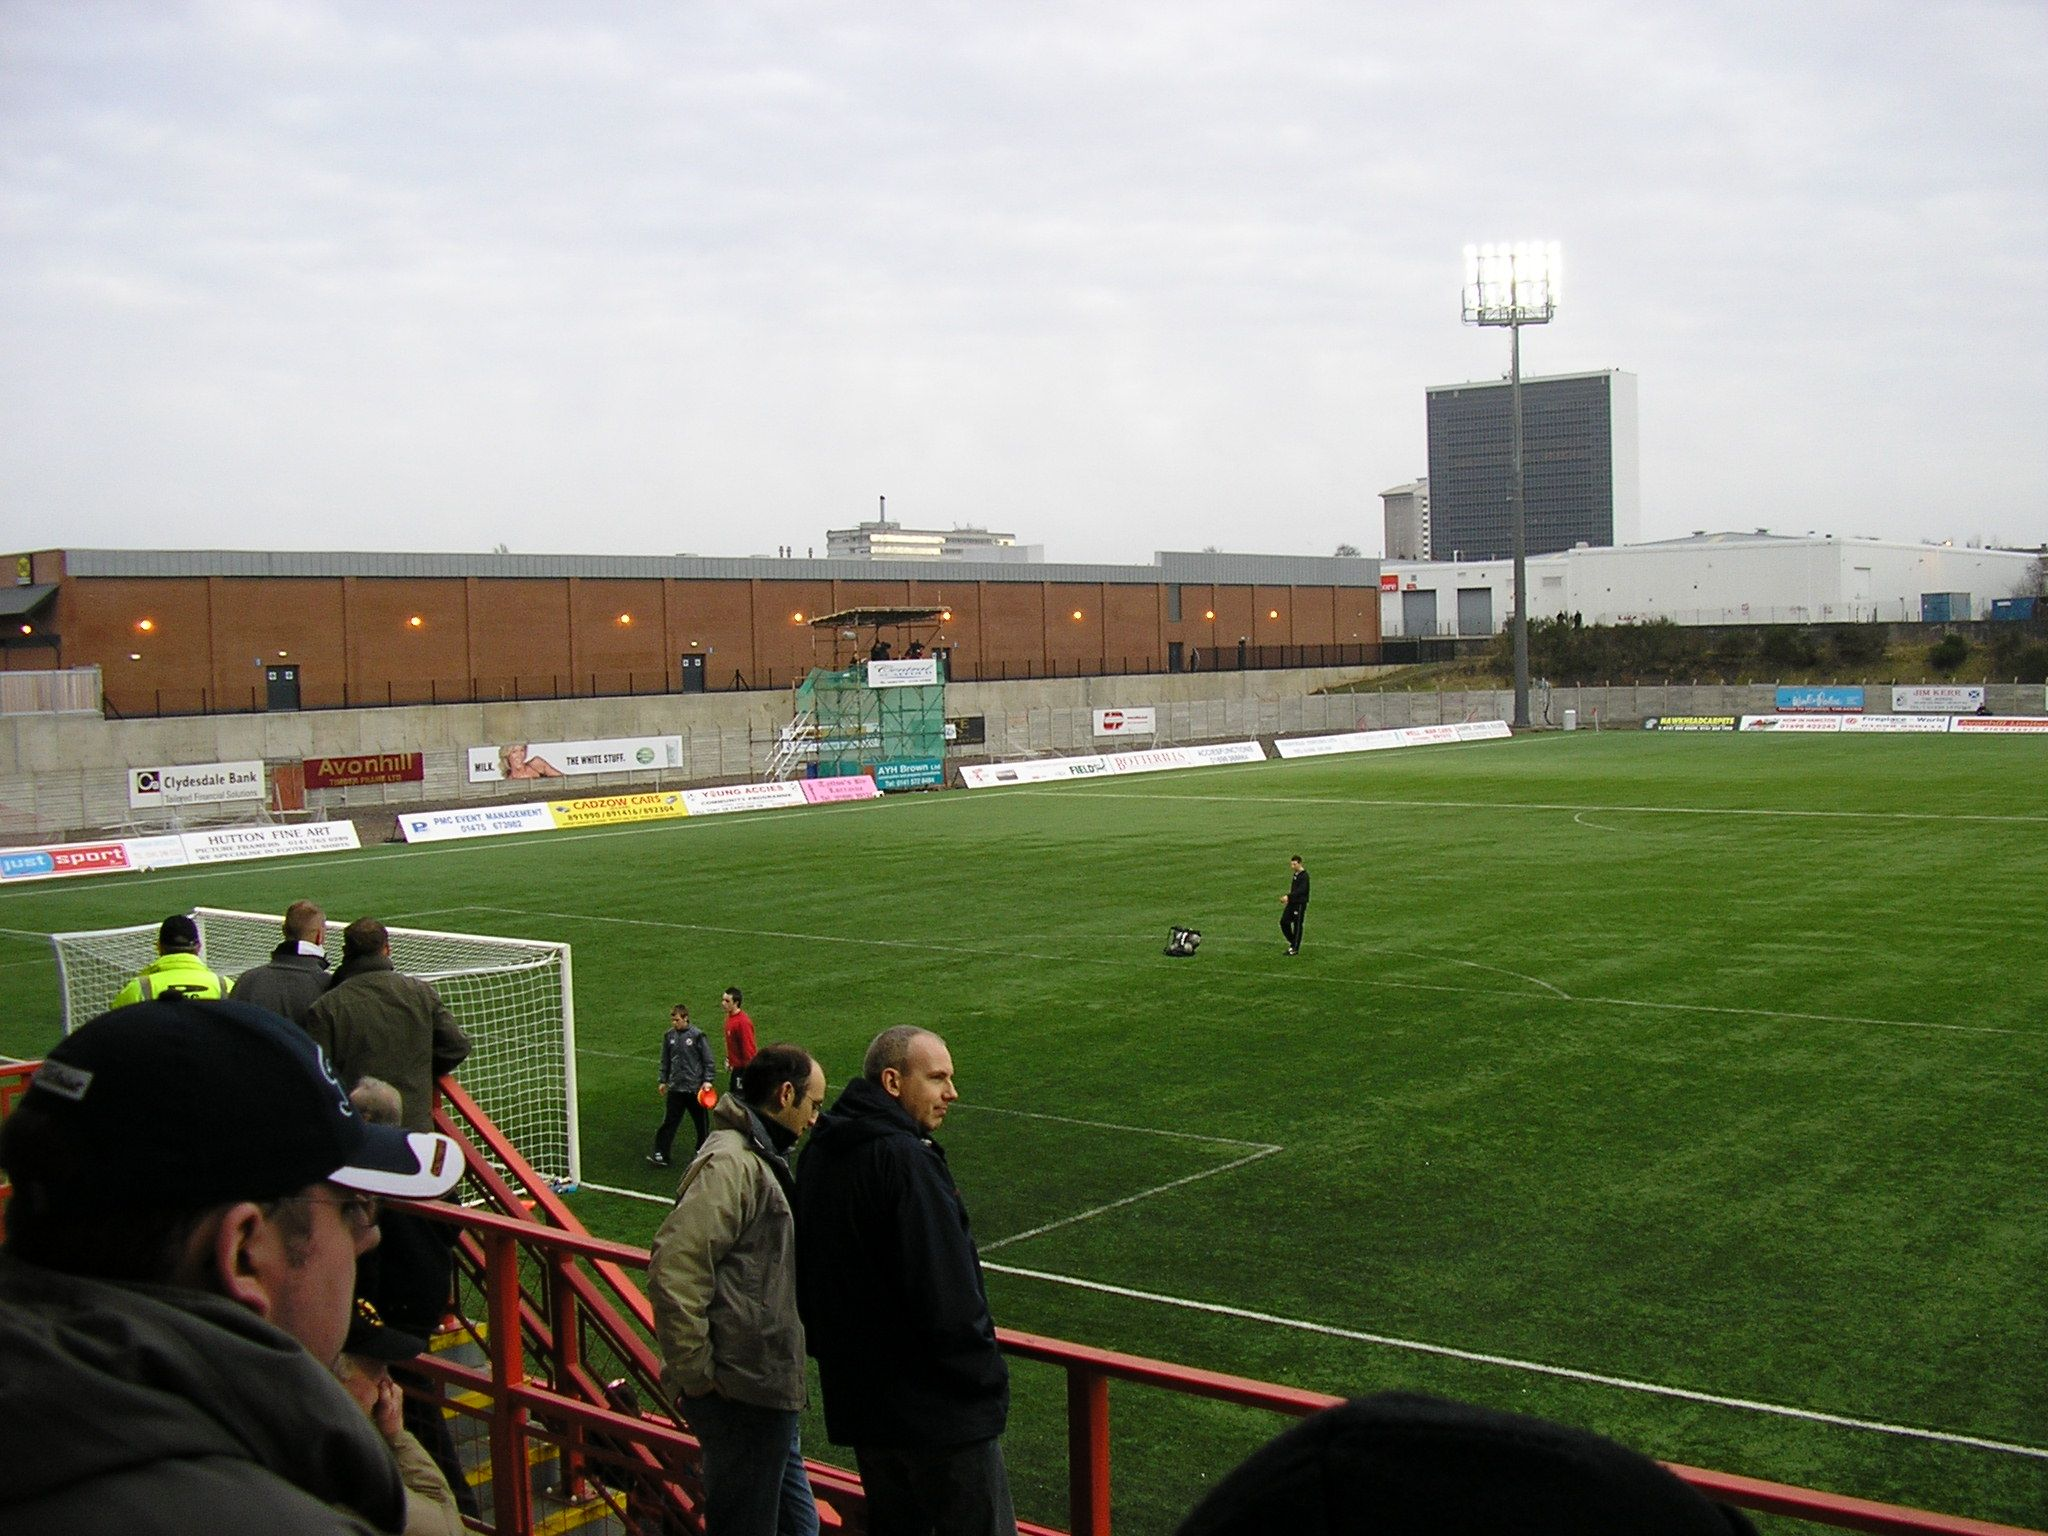 New Douglas Park In 2020 St Mirren British Football St Johnstone